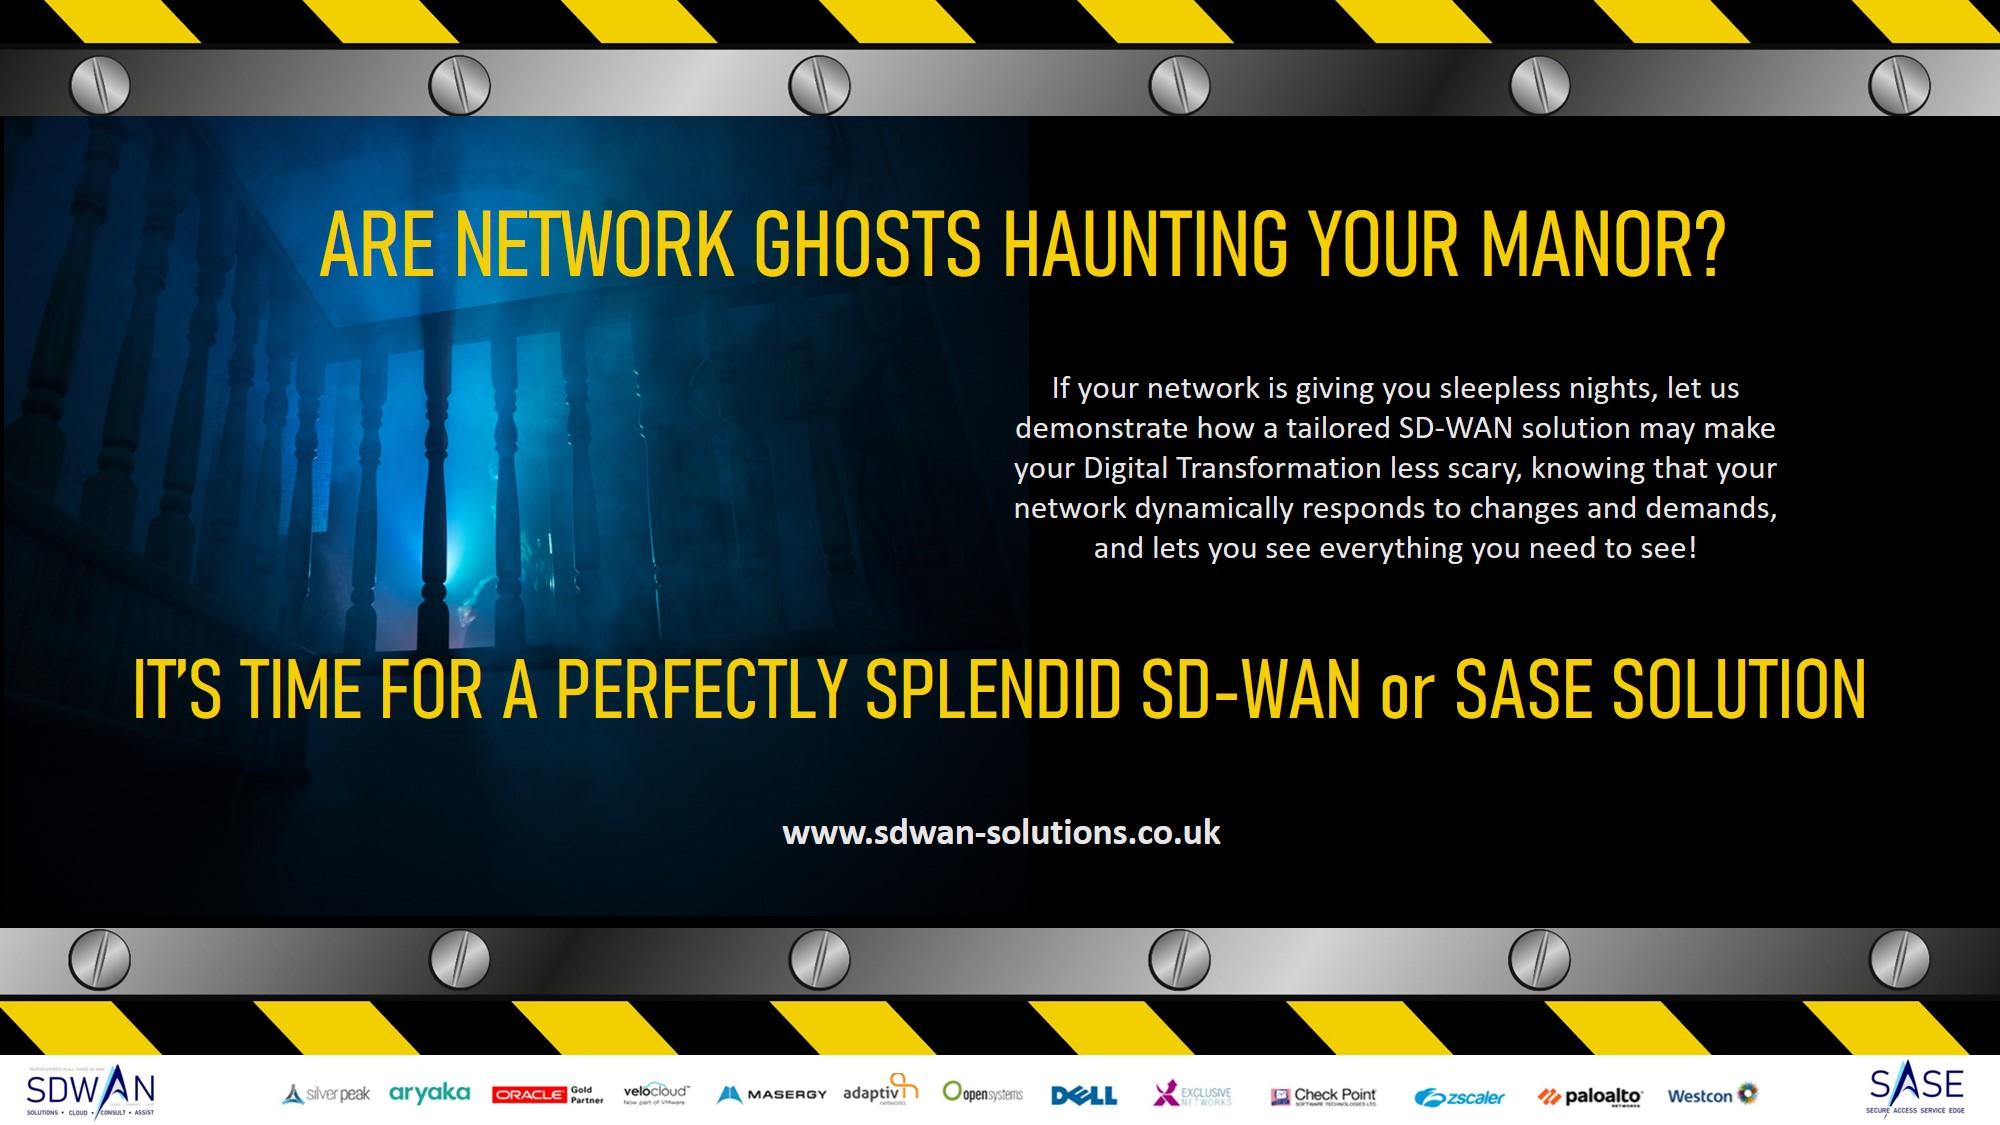 Perfectly splendid SD-WAN or SaSe network